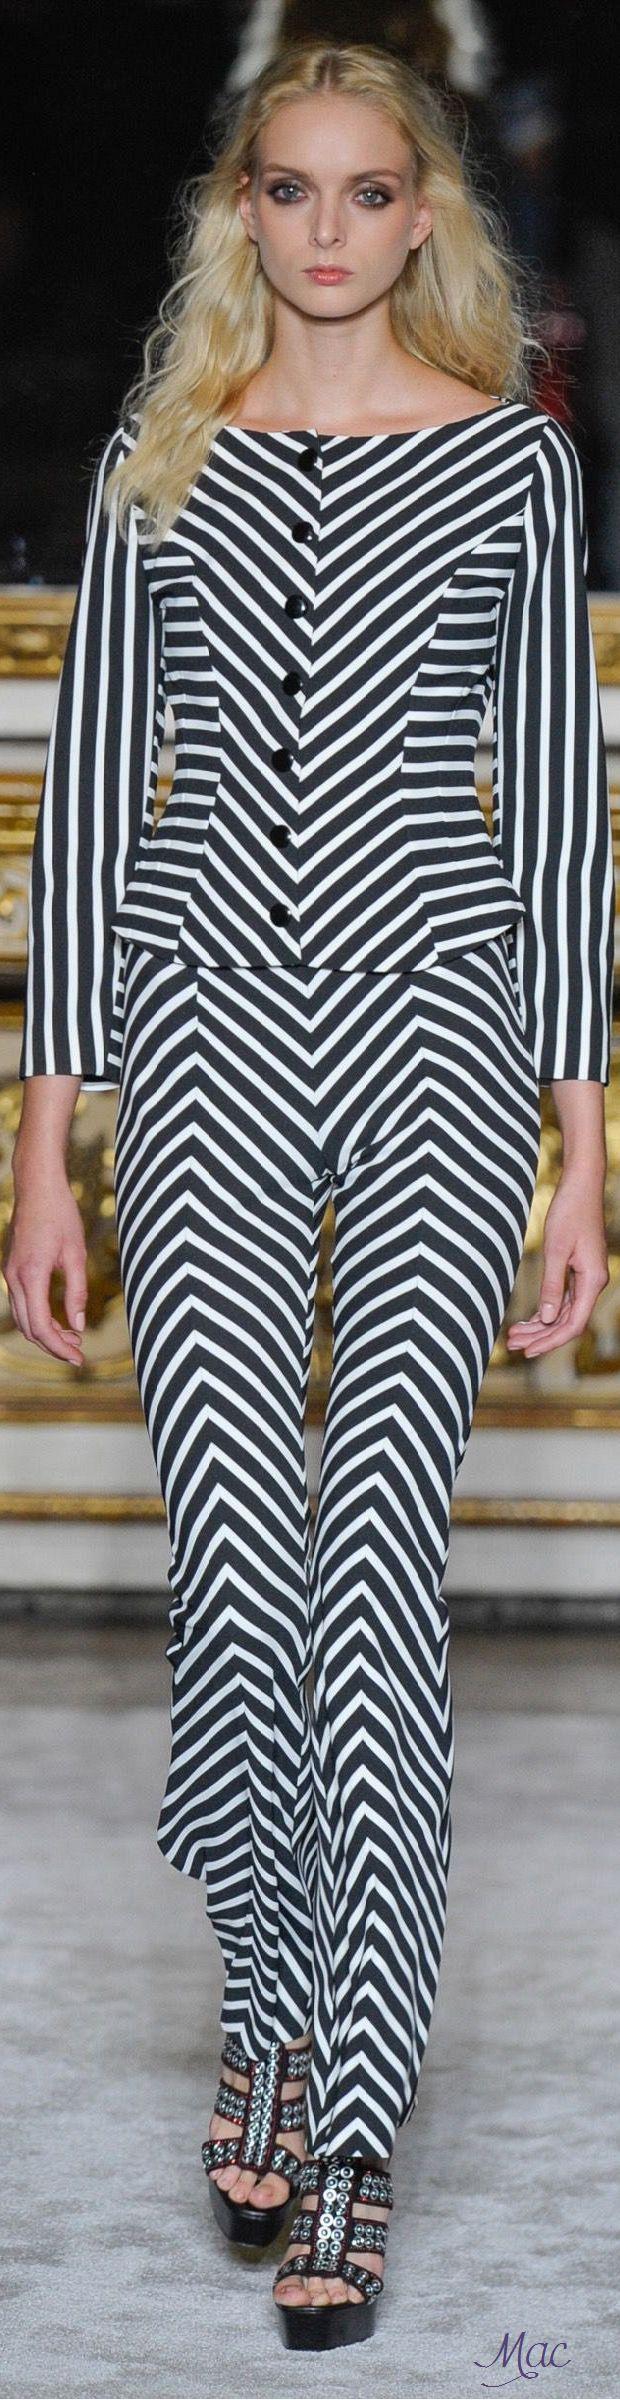 Spring 2016 Ready-to-Wear Roccobarocco: